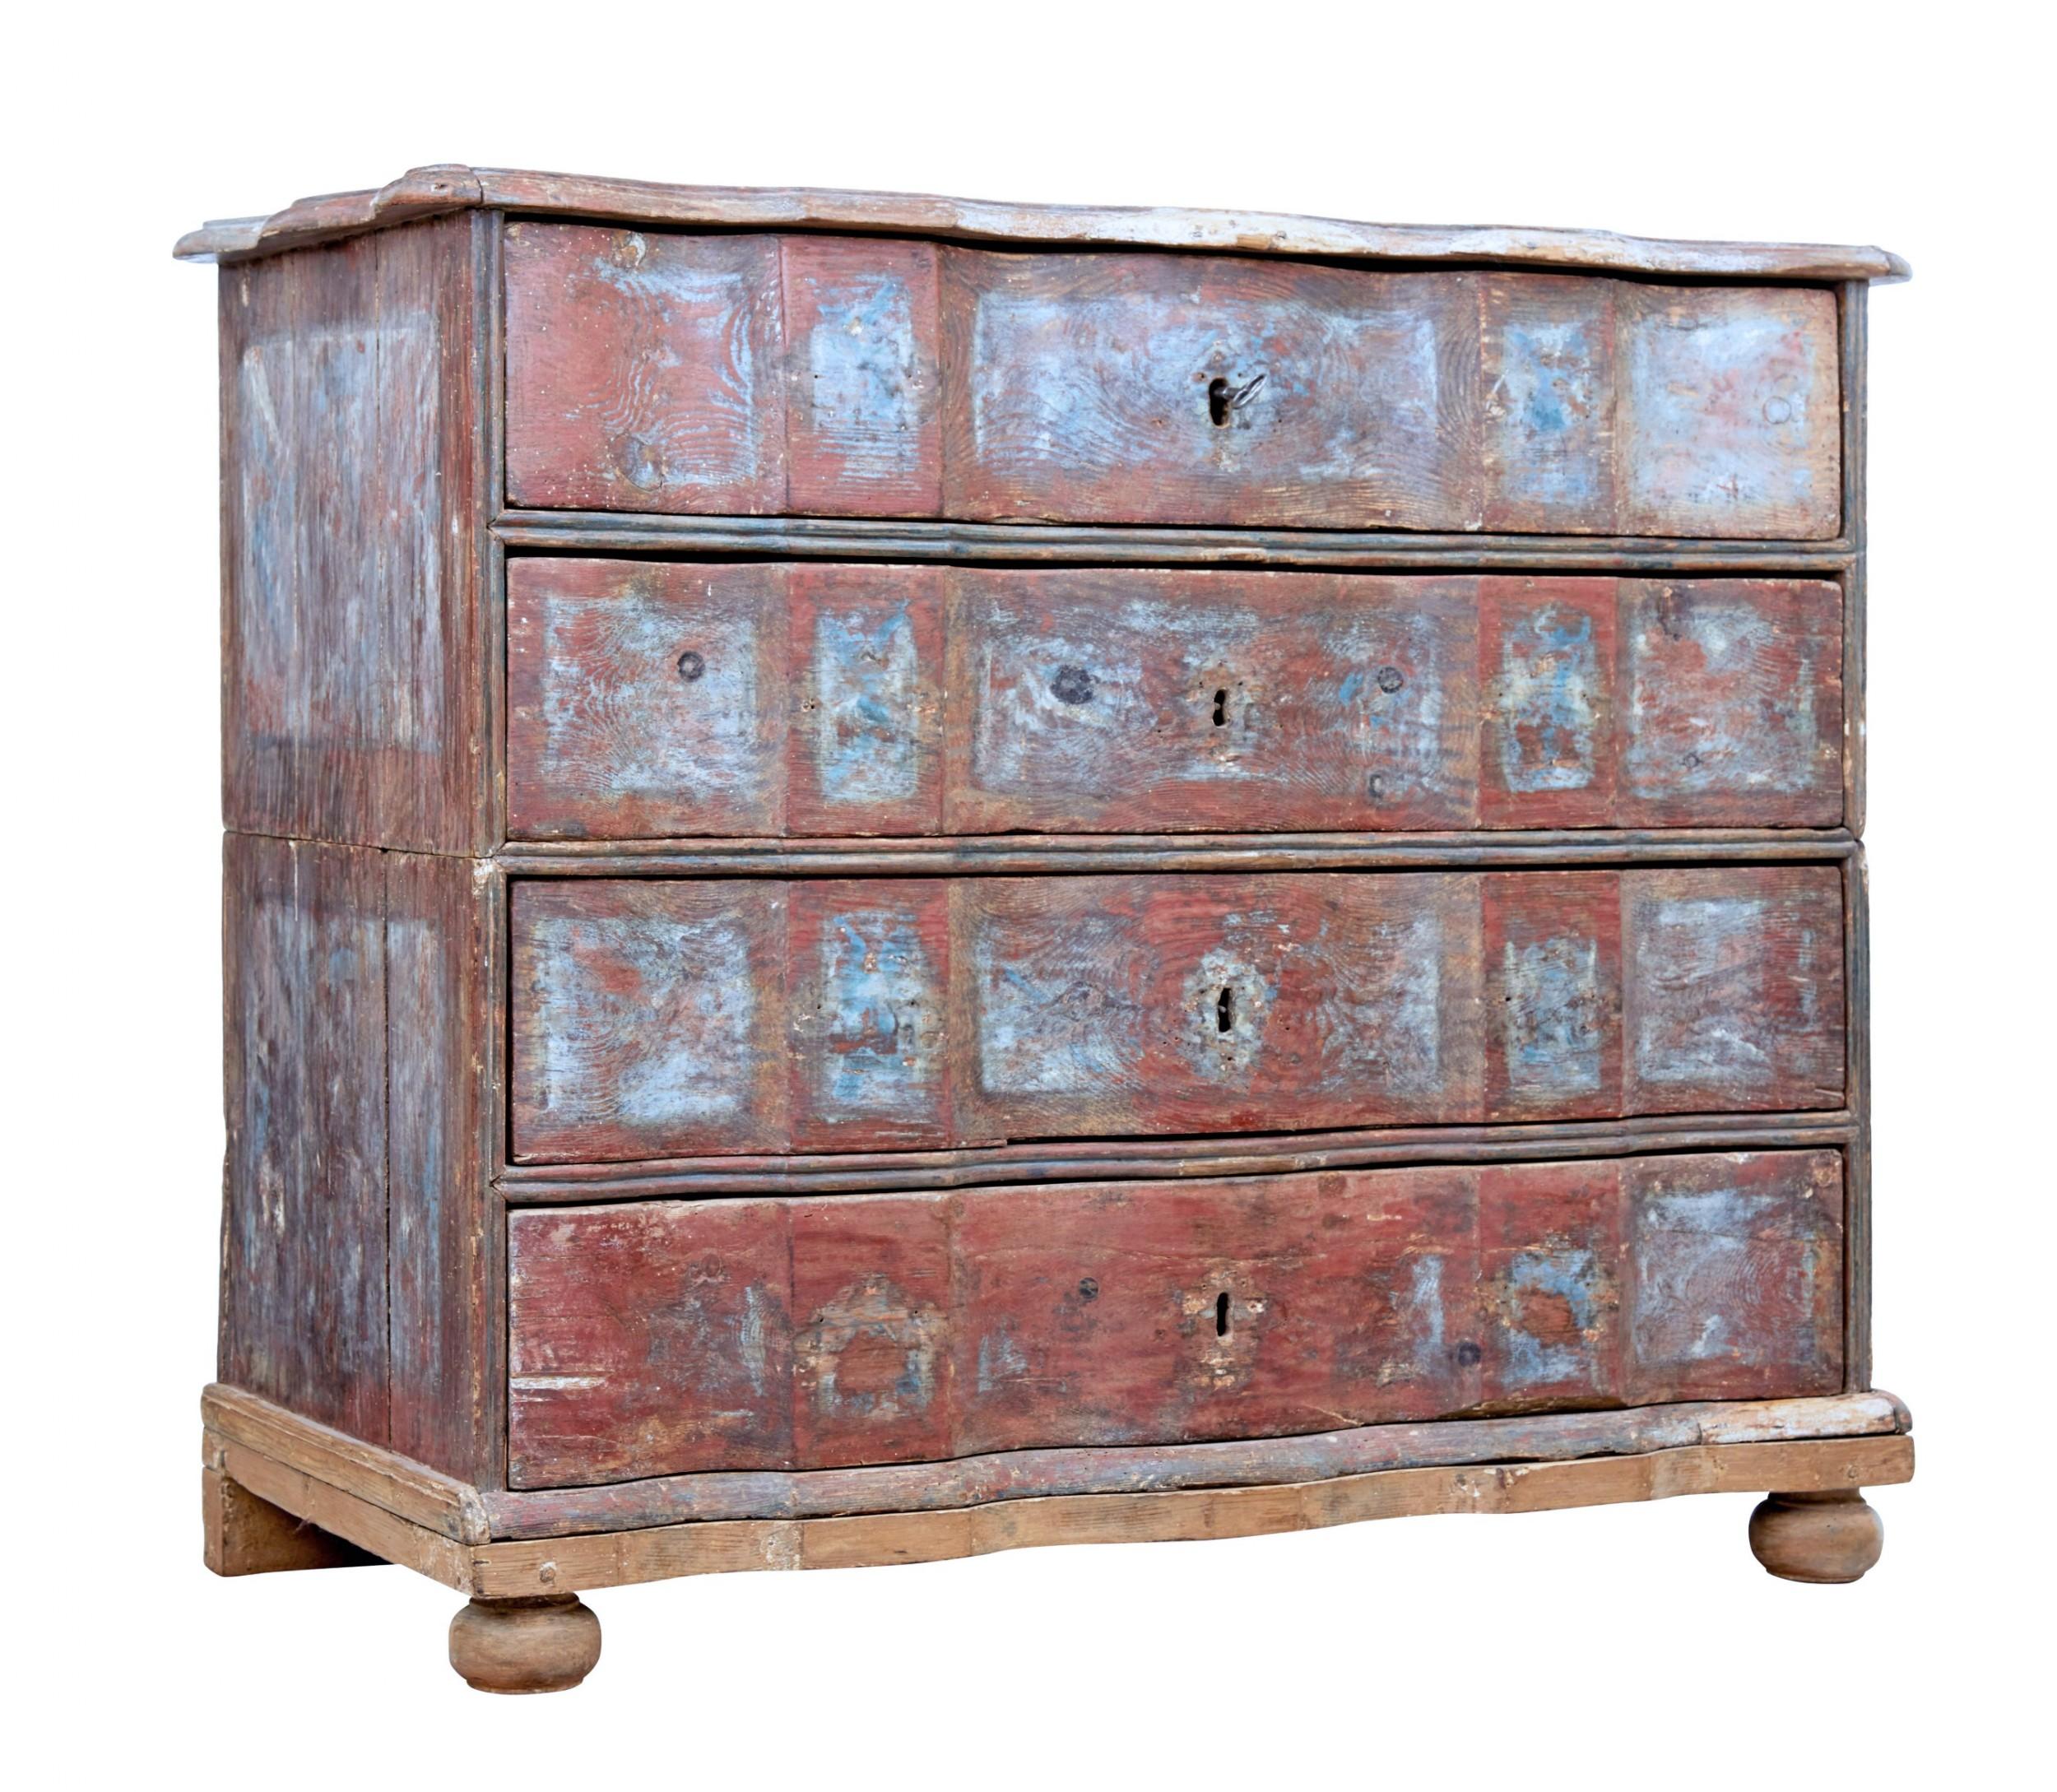 mid 18th century danish pine painted chest of drawers